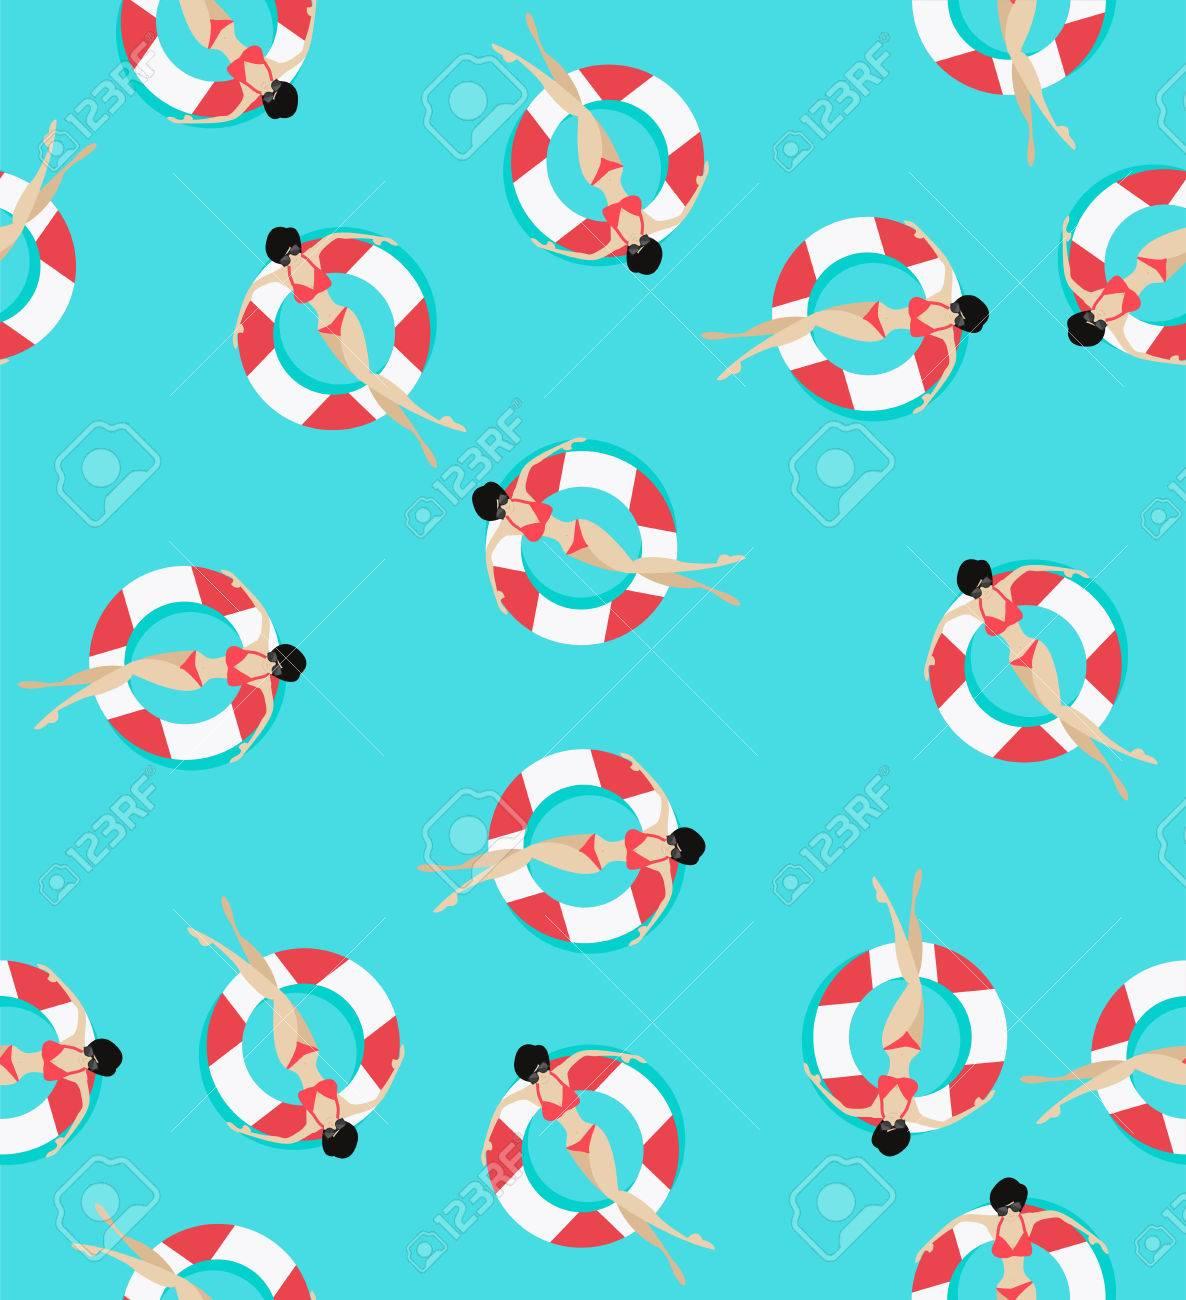 Swim rings pattern - 82665435